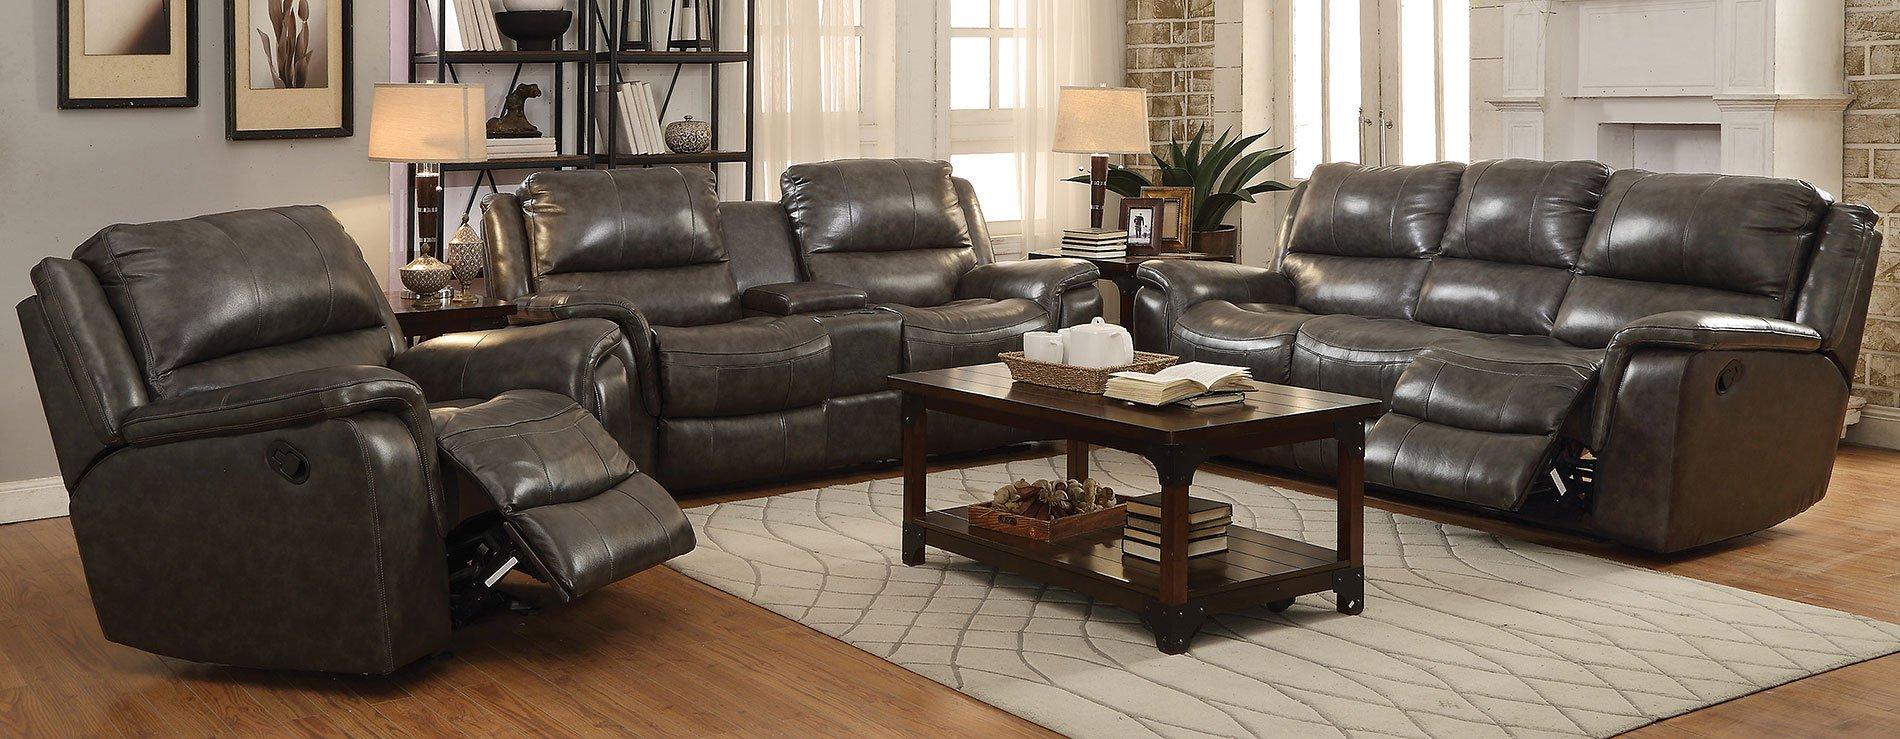 Wingfield Reclining Living Room Set